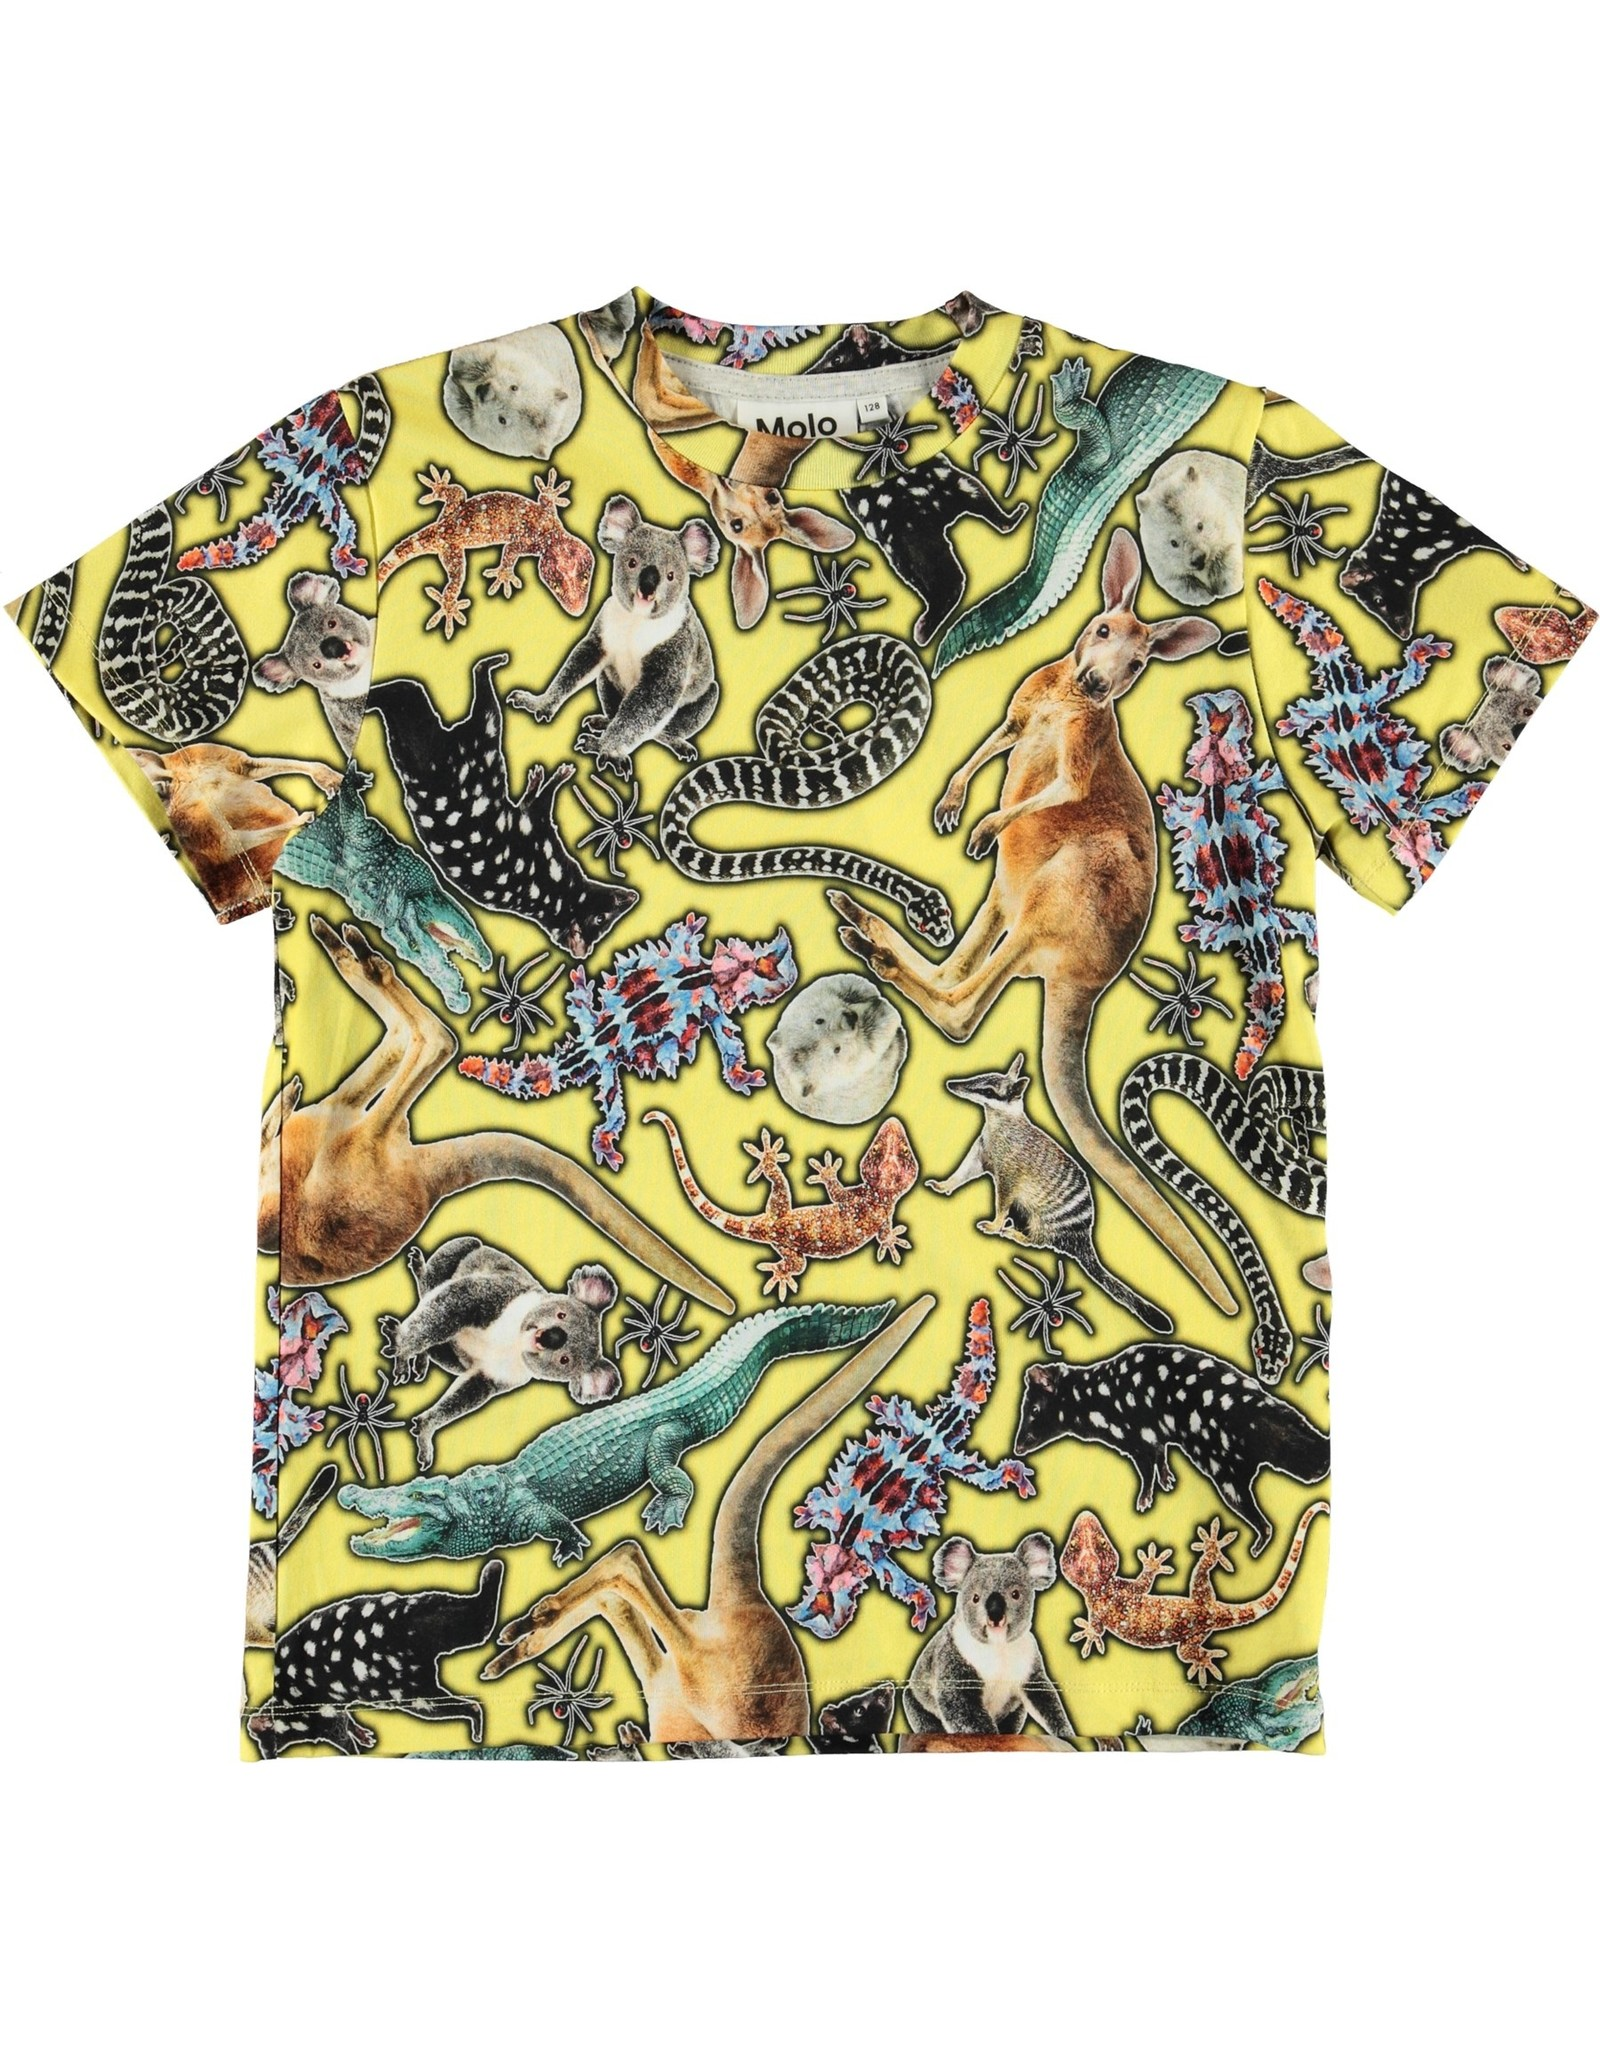 Molo Molo Roxo Yellow Animals